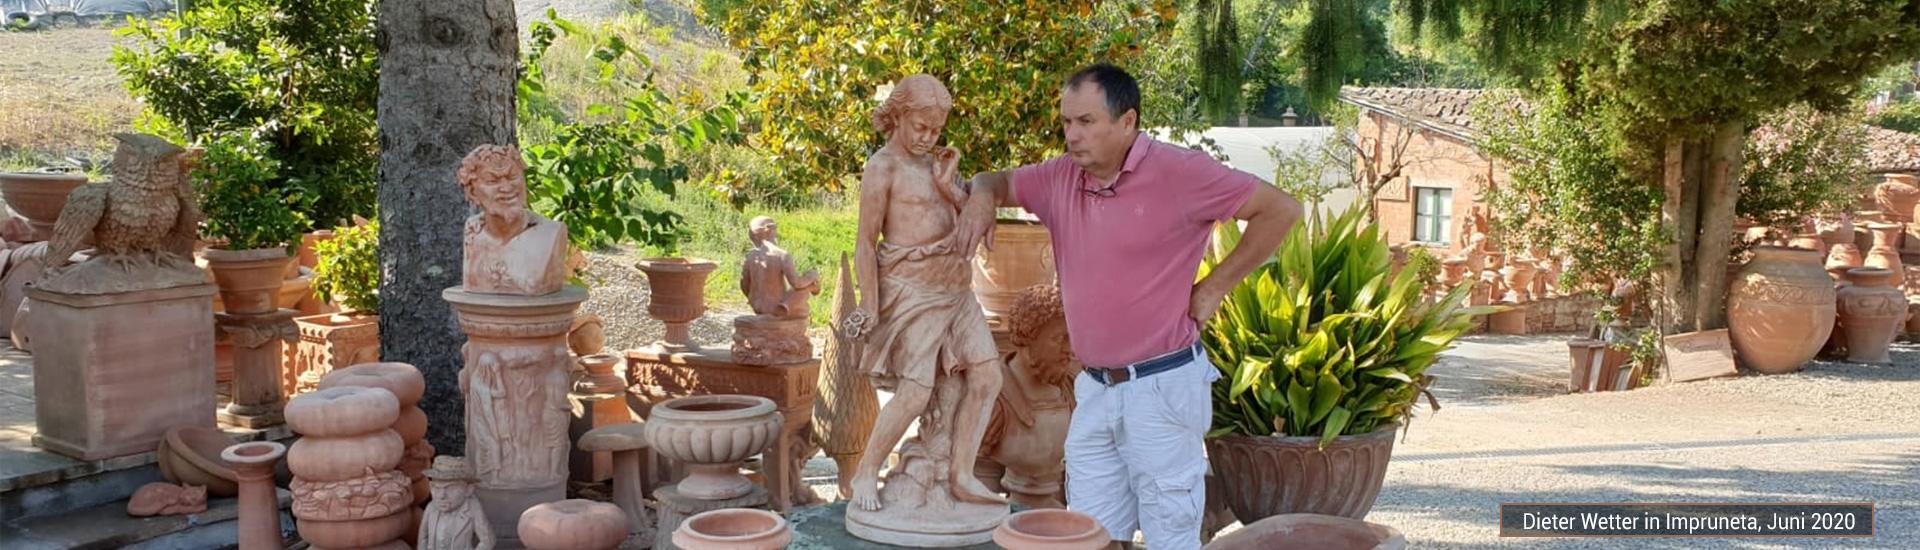 Dieter Wetter, Terracotta aus Impruneta - dem sonnigen Italien